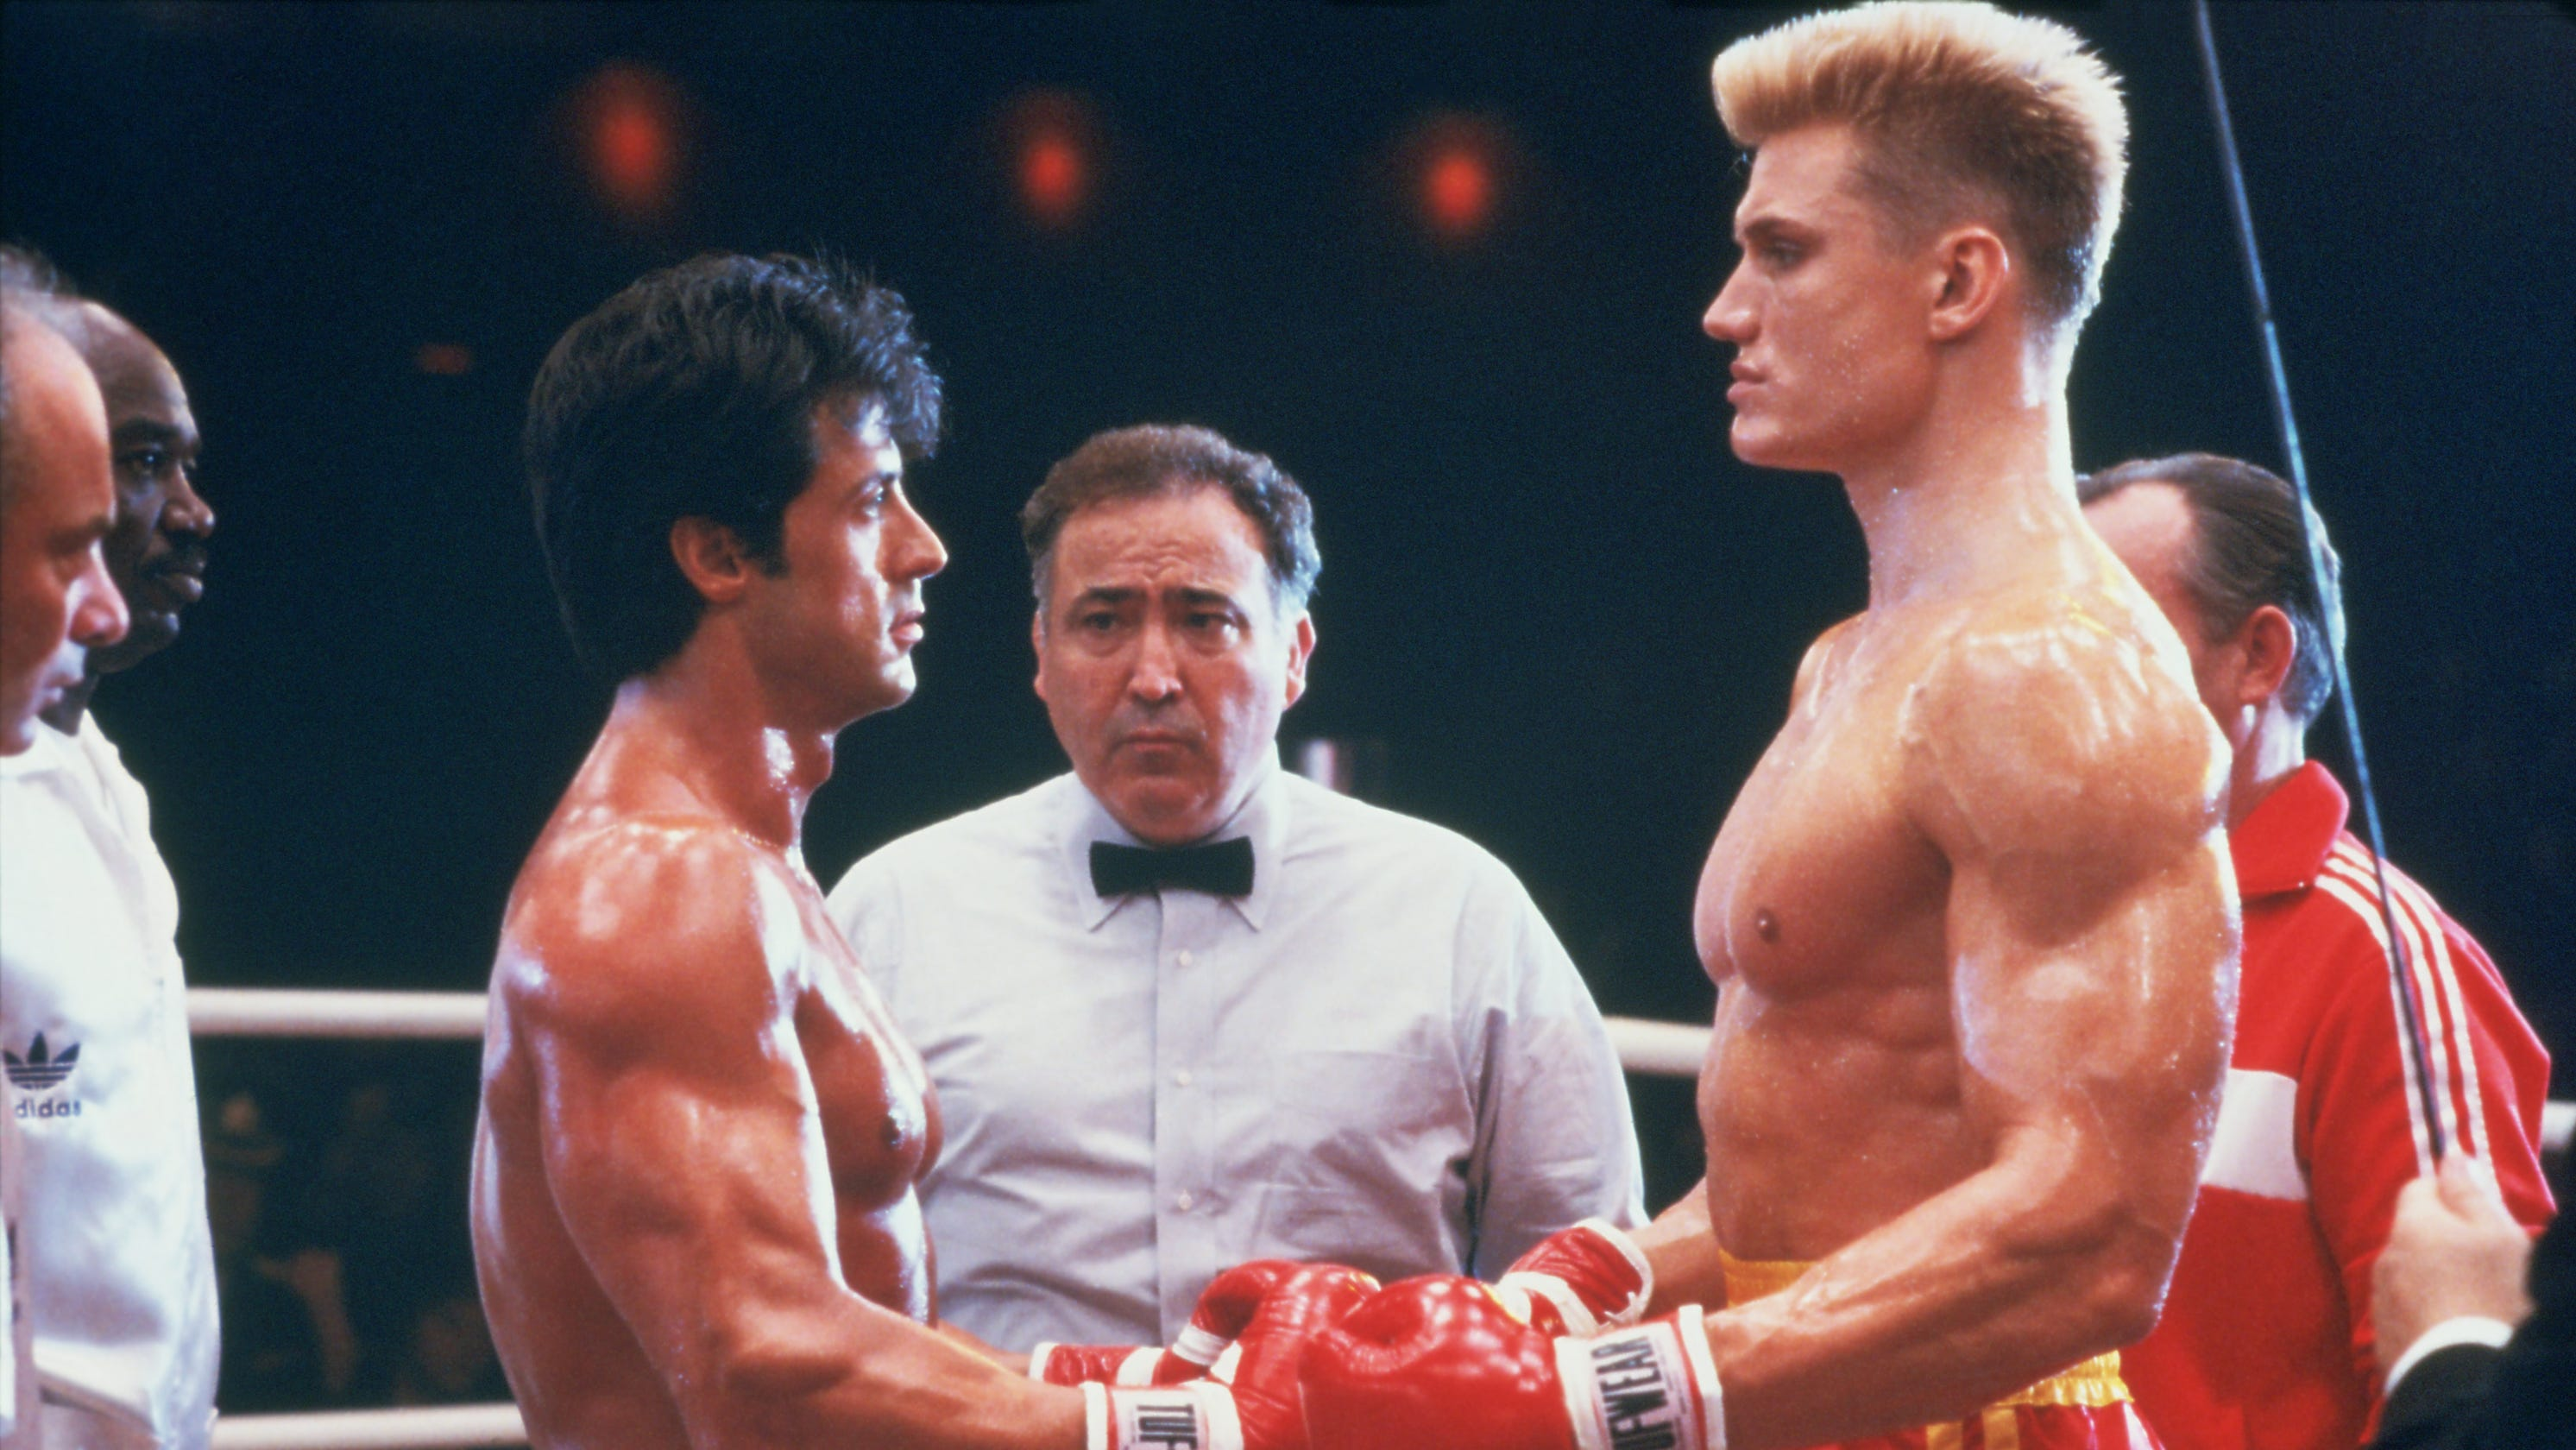 Creed 2' rewrites Dolph Lundgren's 'Rocky IV' cold saga